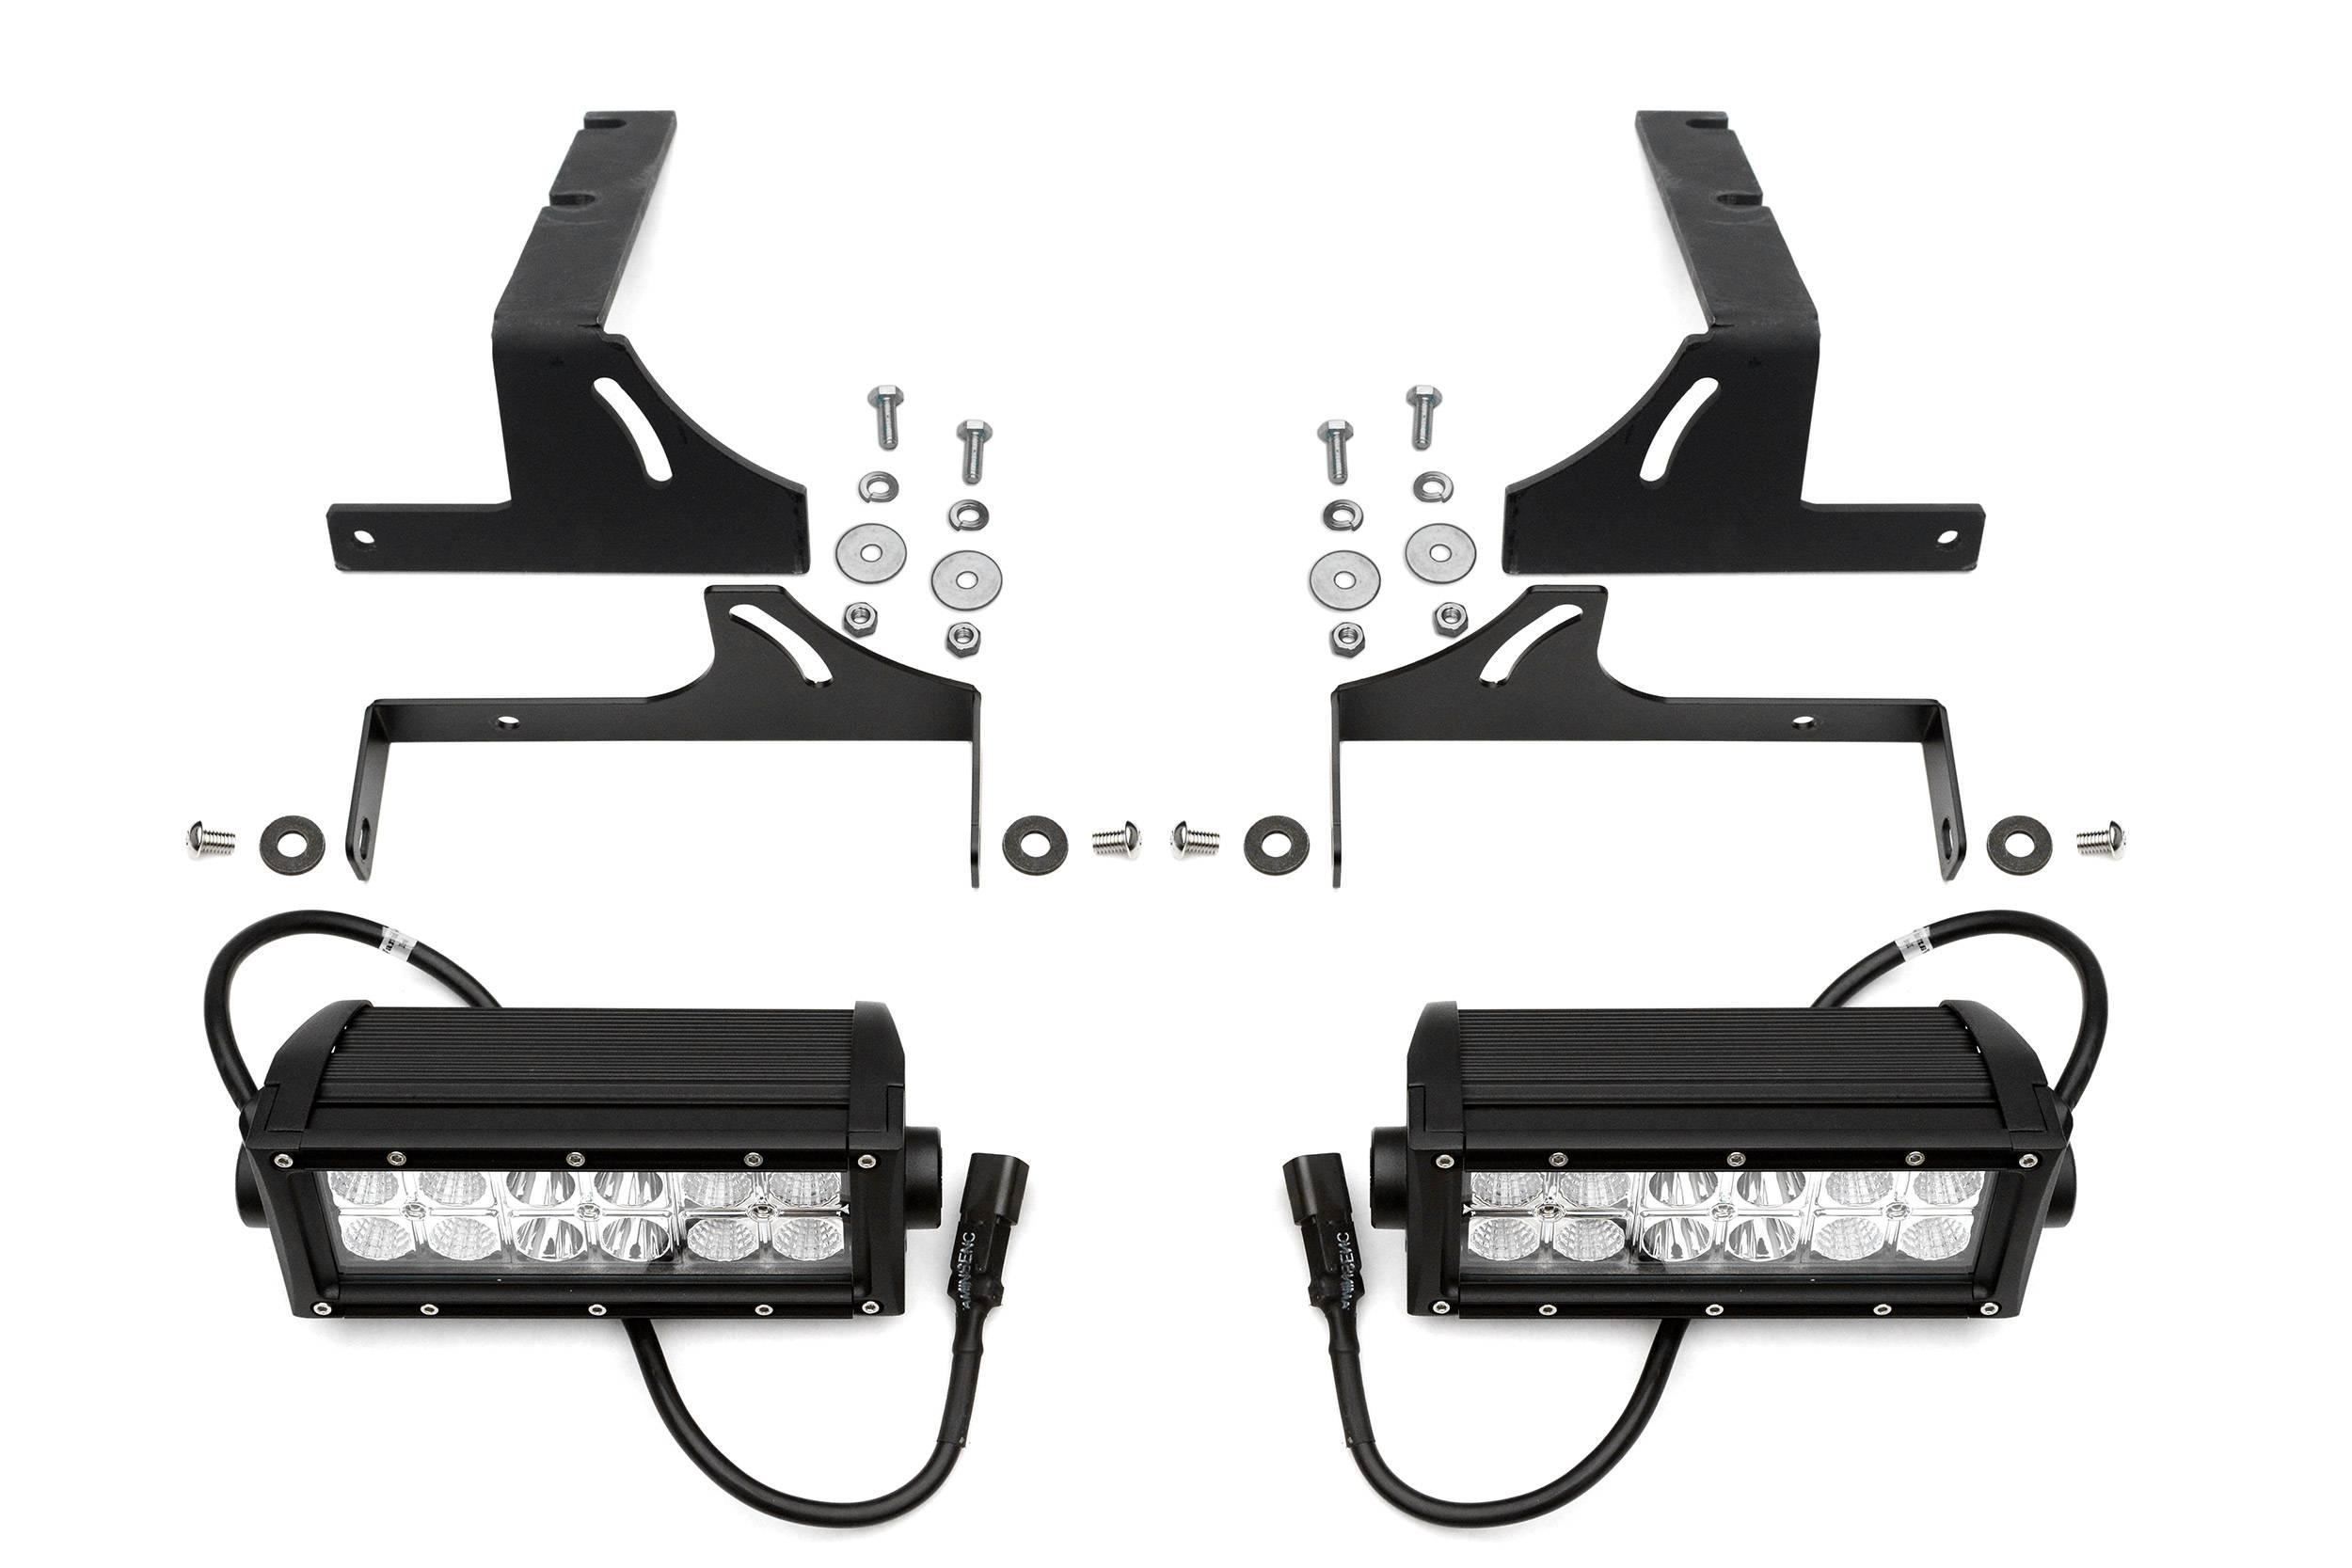 ZROADZ                                             - 2007-2018 Silverado,Sierra 1500 Rear Bumper LED Kit with (2) 6 Inch LED Straight Double Row Light Bars - PN #Z382051-KIT